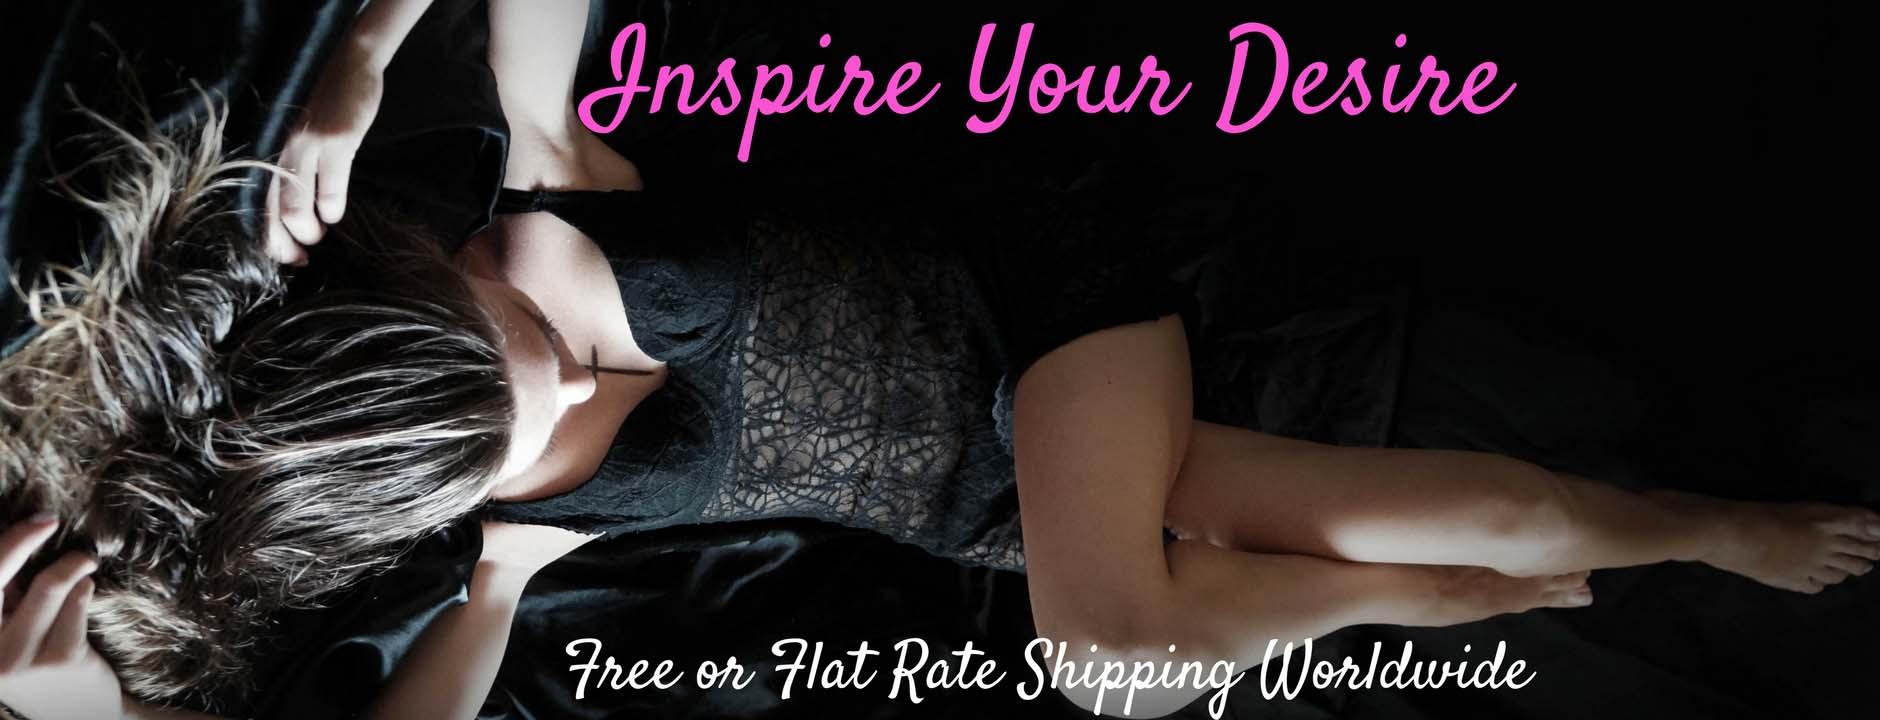 Inspire Your Desire